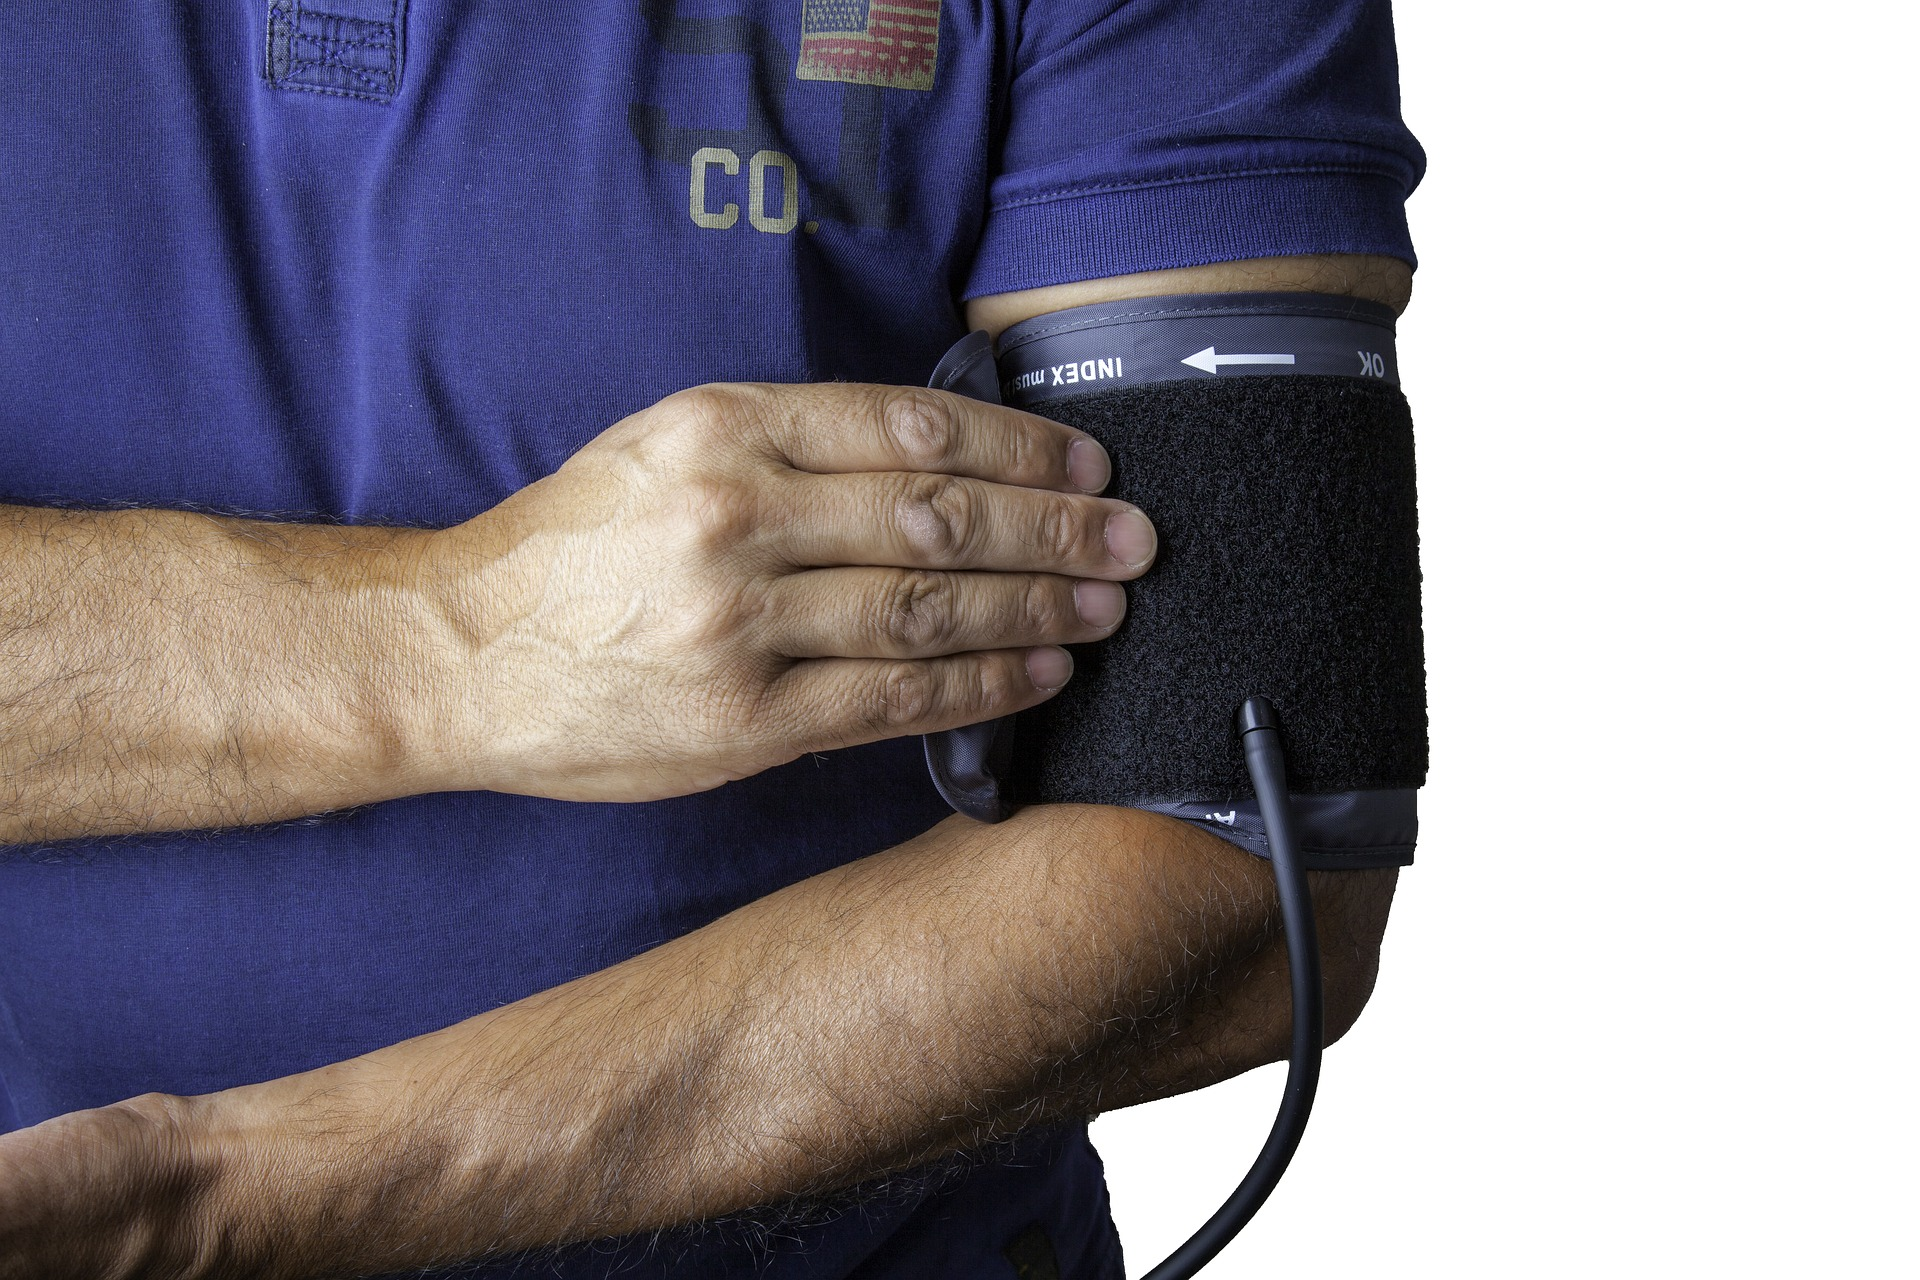 semne ca esti bolnav - sfatulparintilor.ro - pixabay_com - blood-pressure-monitor-1749577_1920